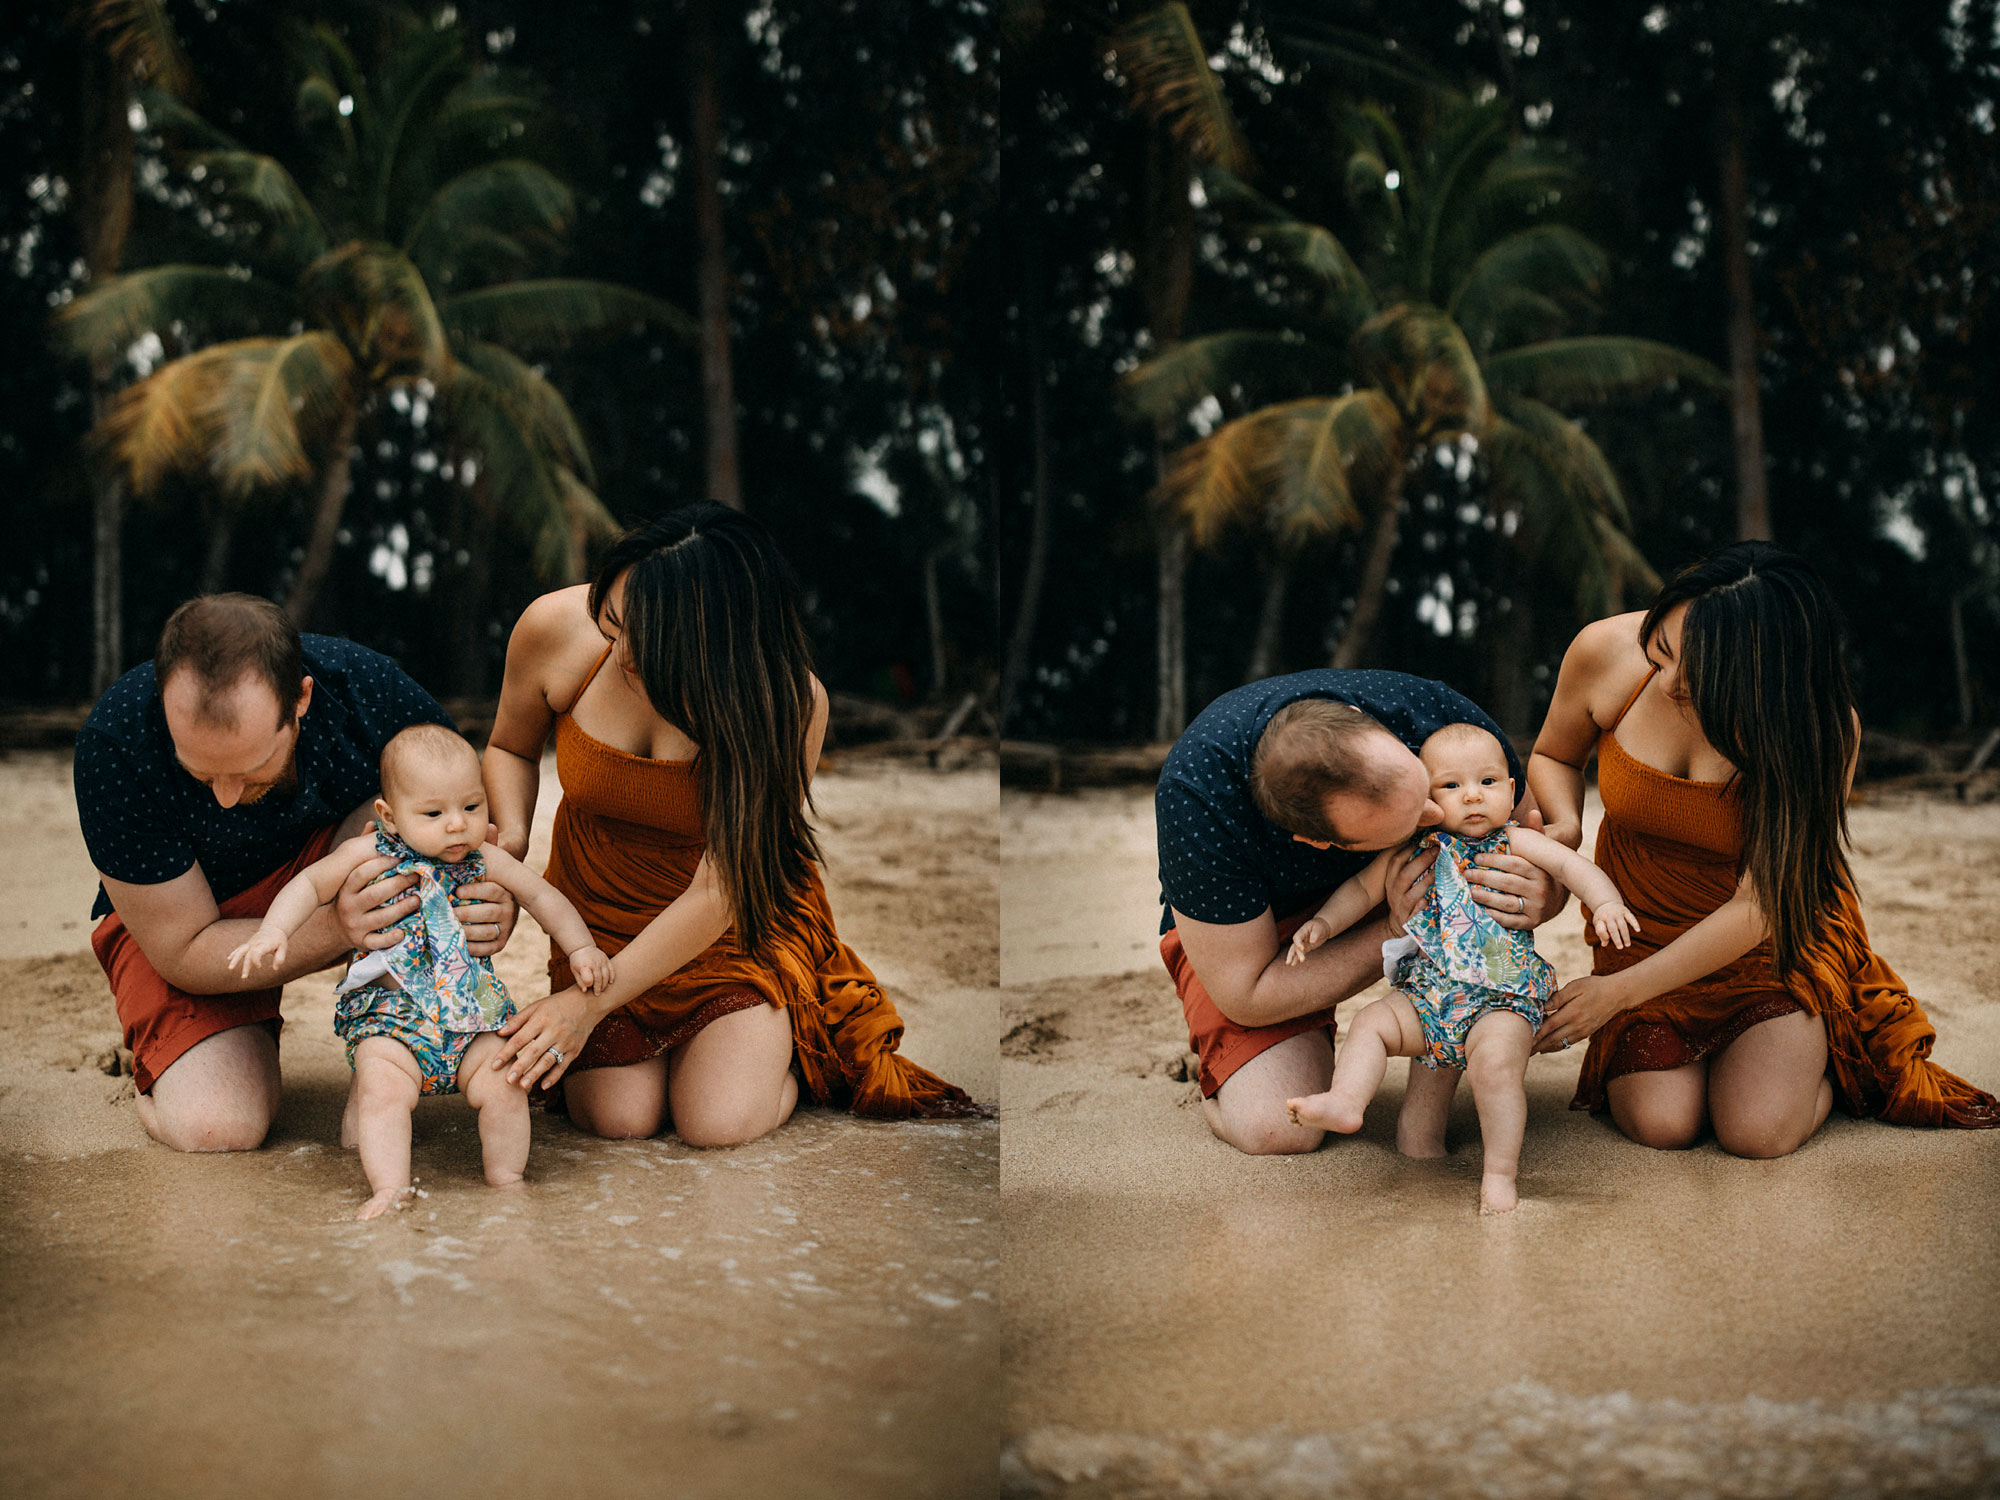 Family-Photographer-North-Shore-Oahu-Hawaii-15.jpg